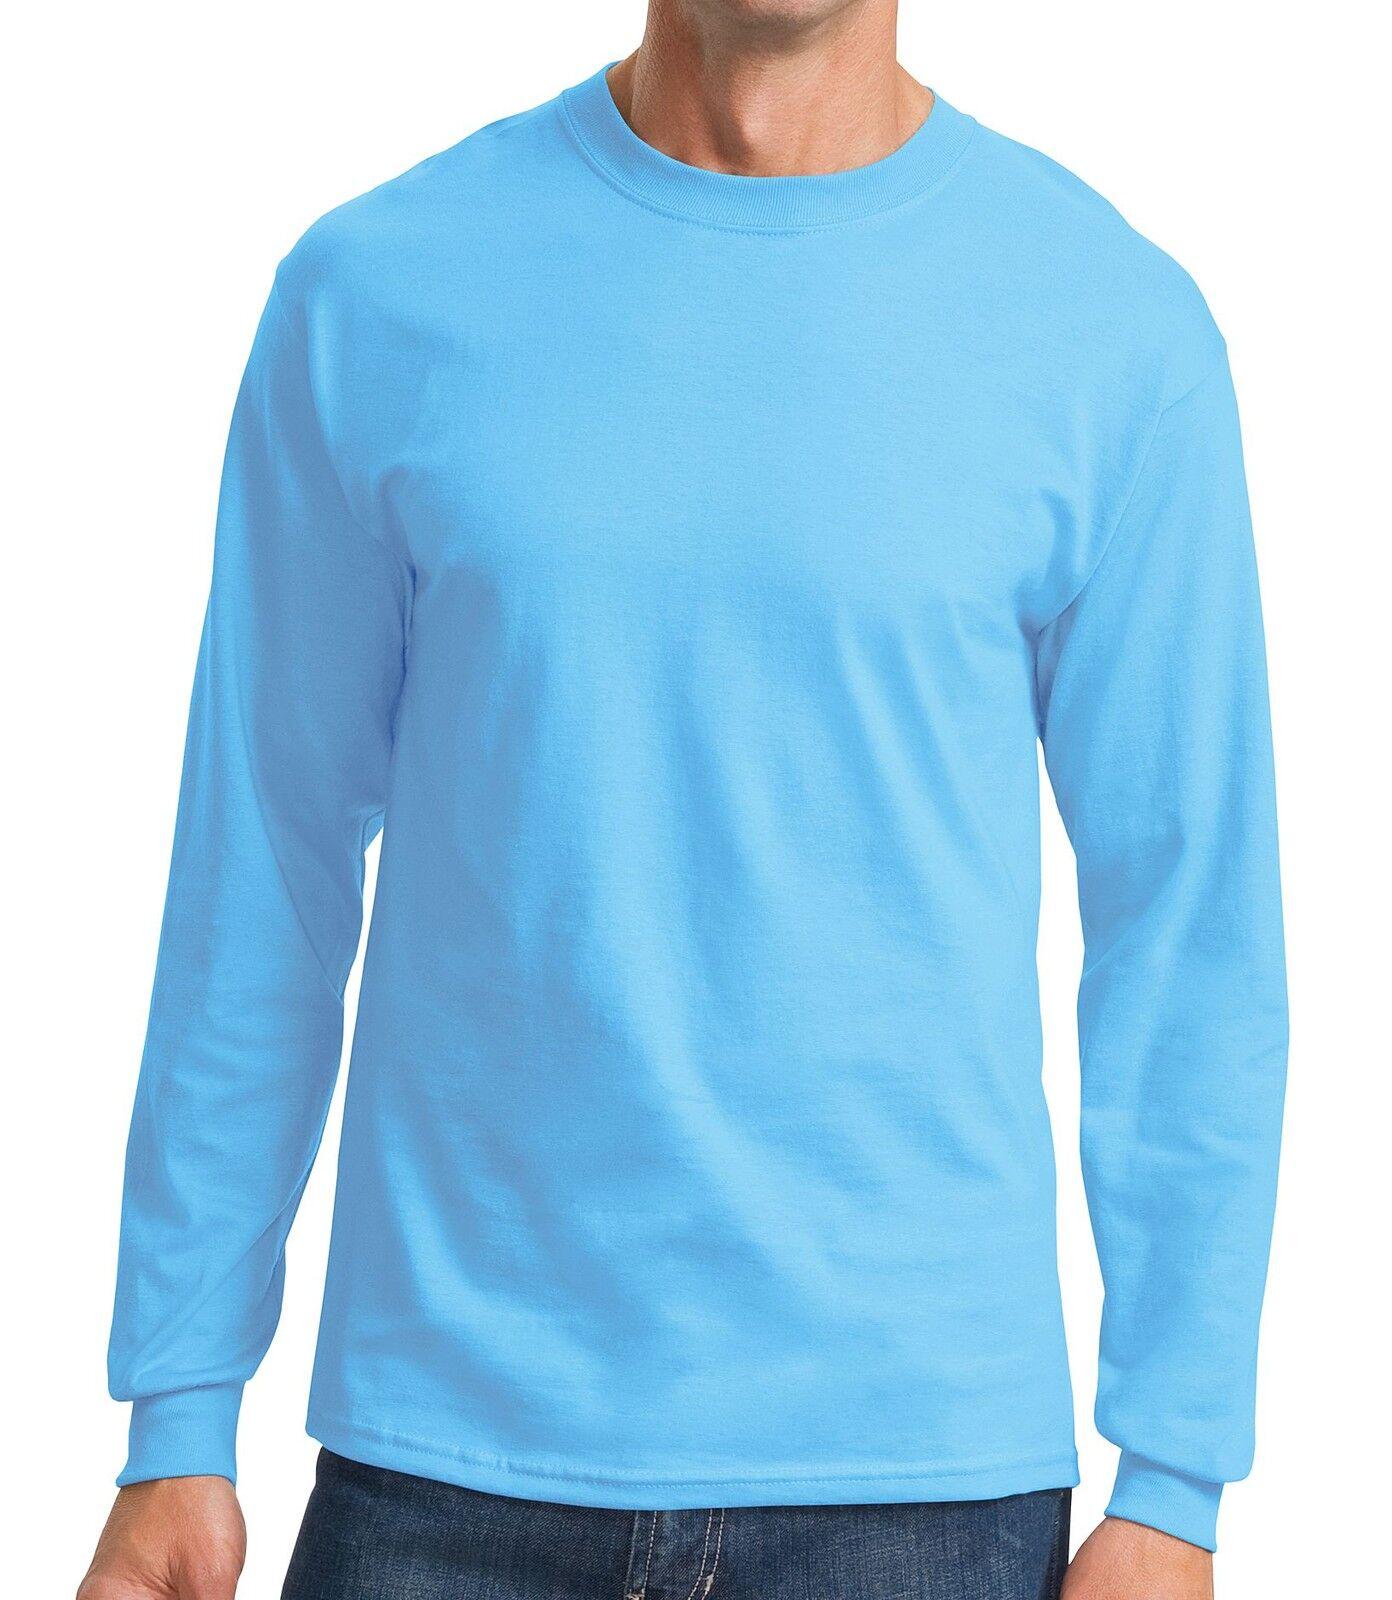 Men 39 s tall crewneck t shirt preshrunk 100 cotton long for Mens xlt t shirts